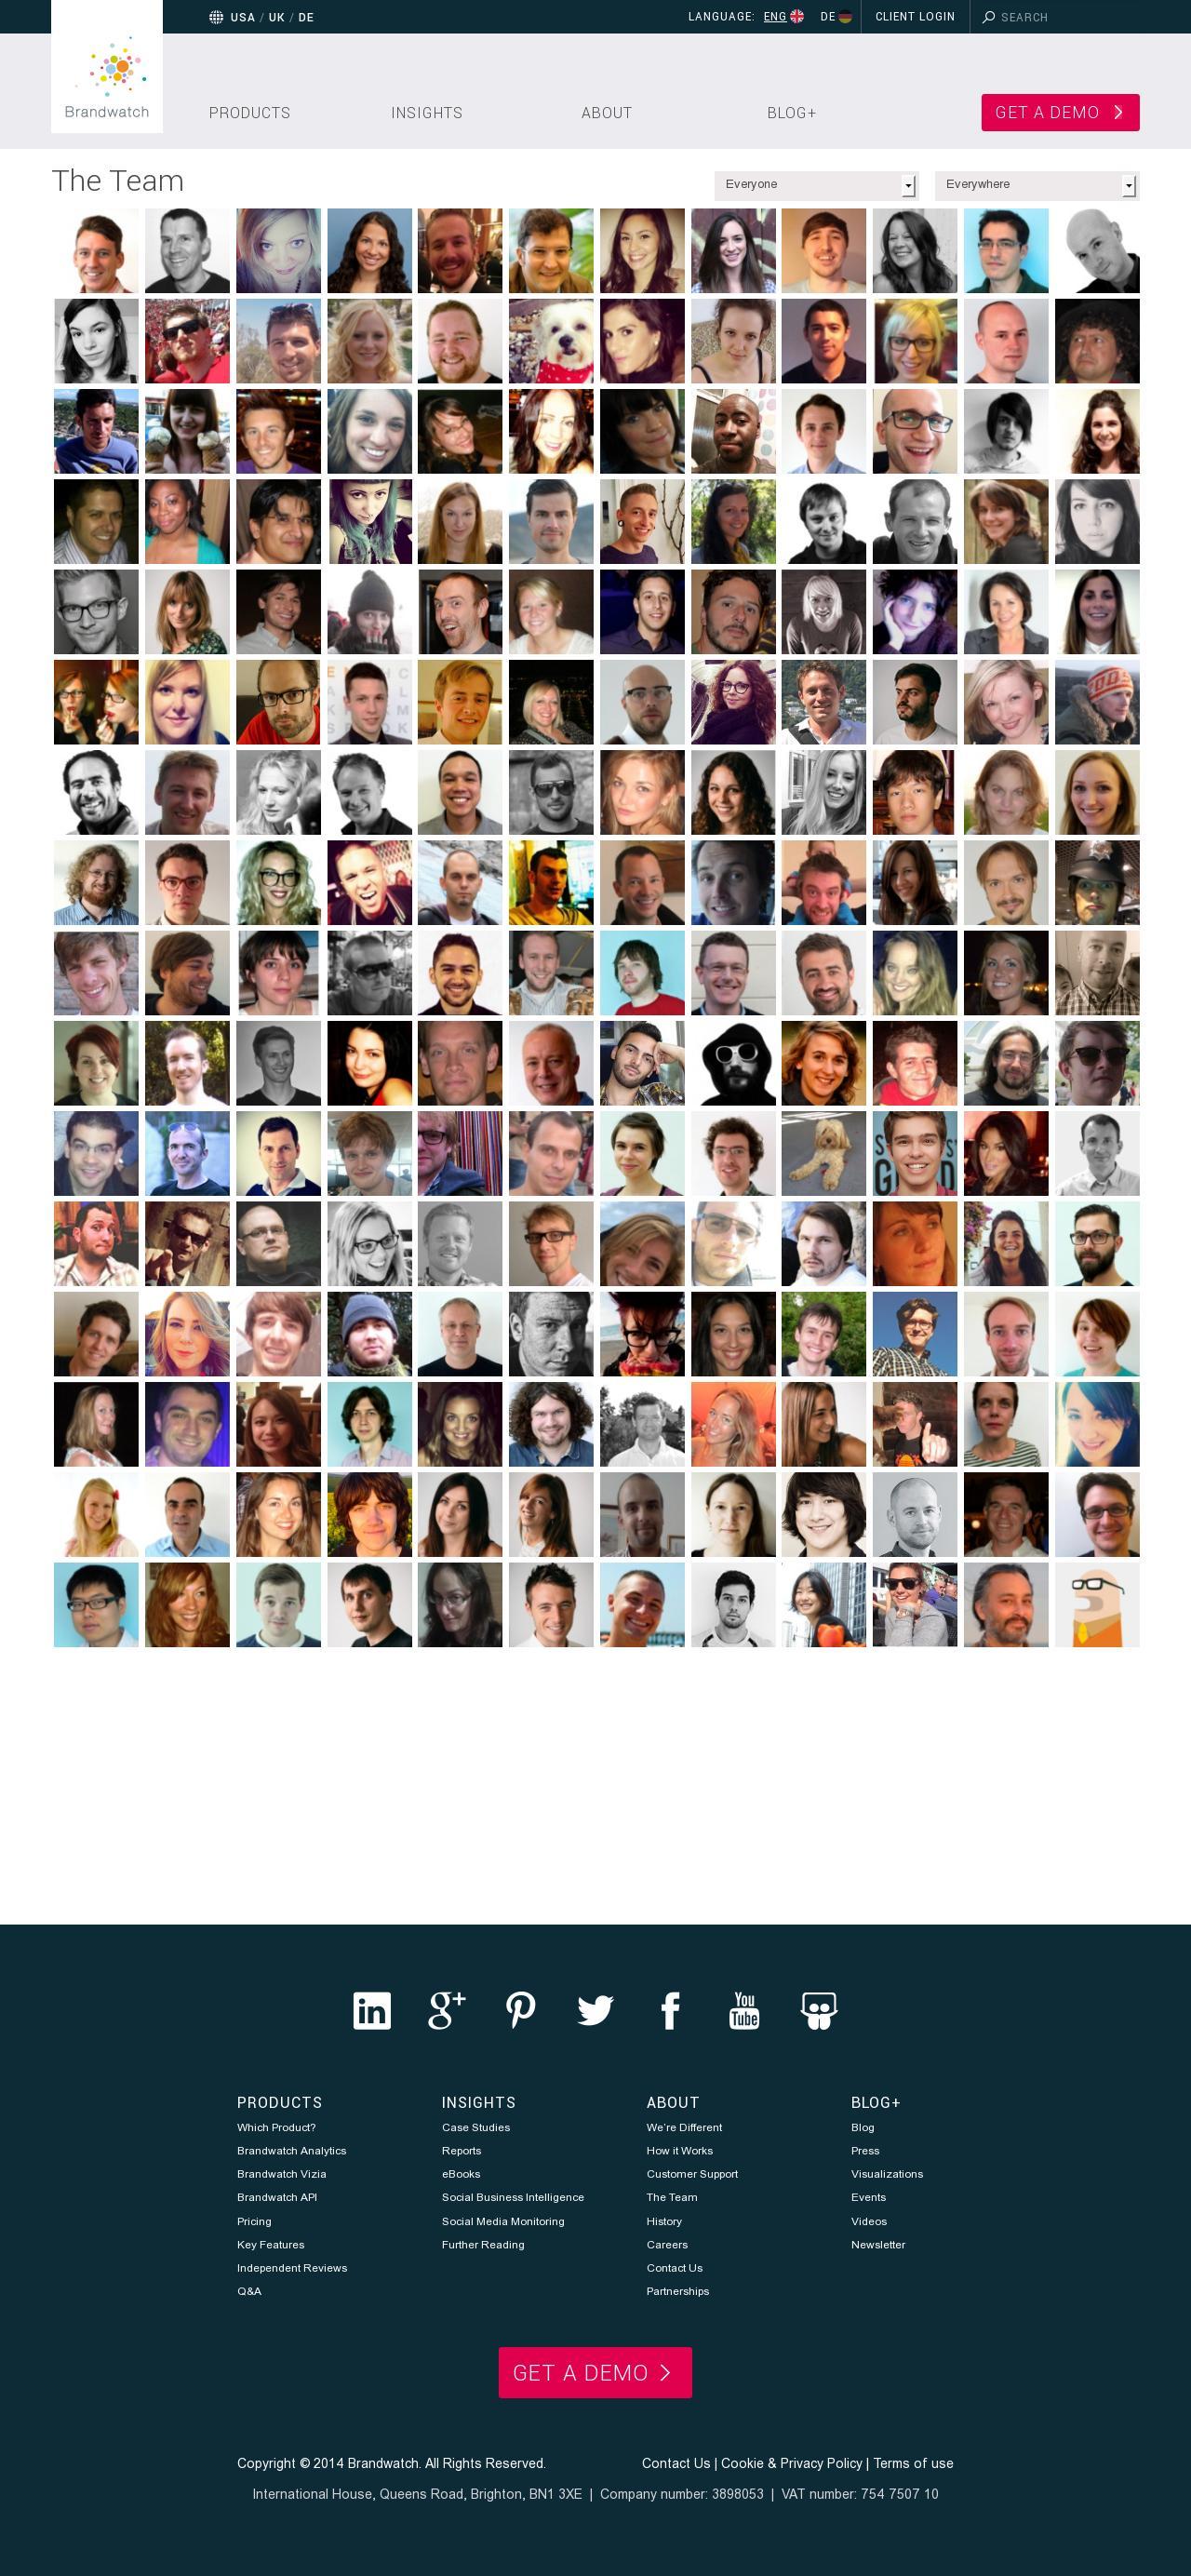 Screenshot of brandwatch.com - Team Members Archive - Brandwatch - captured July 21, 2014